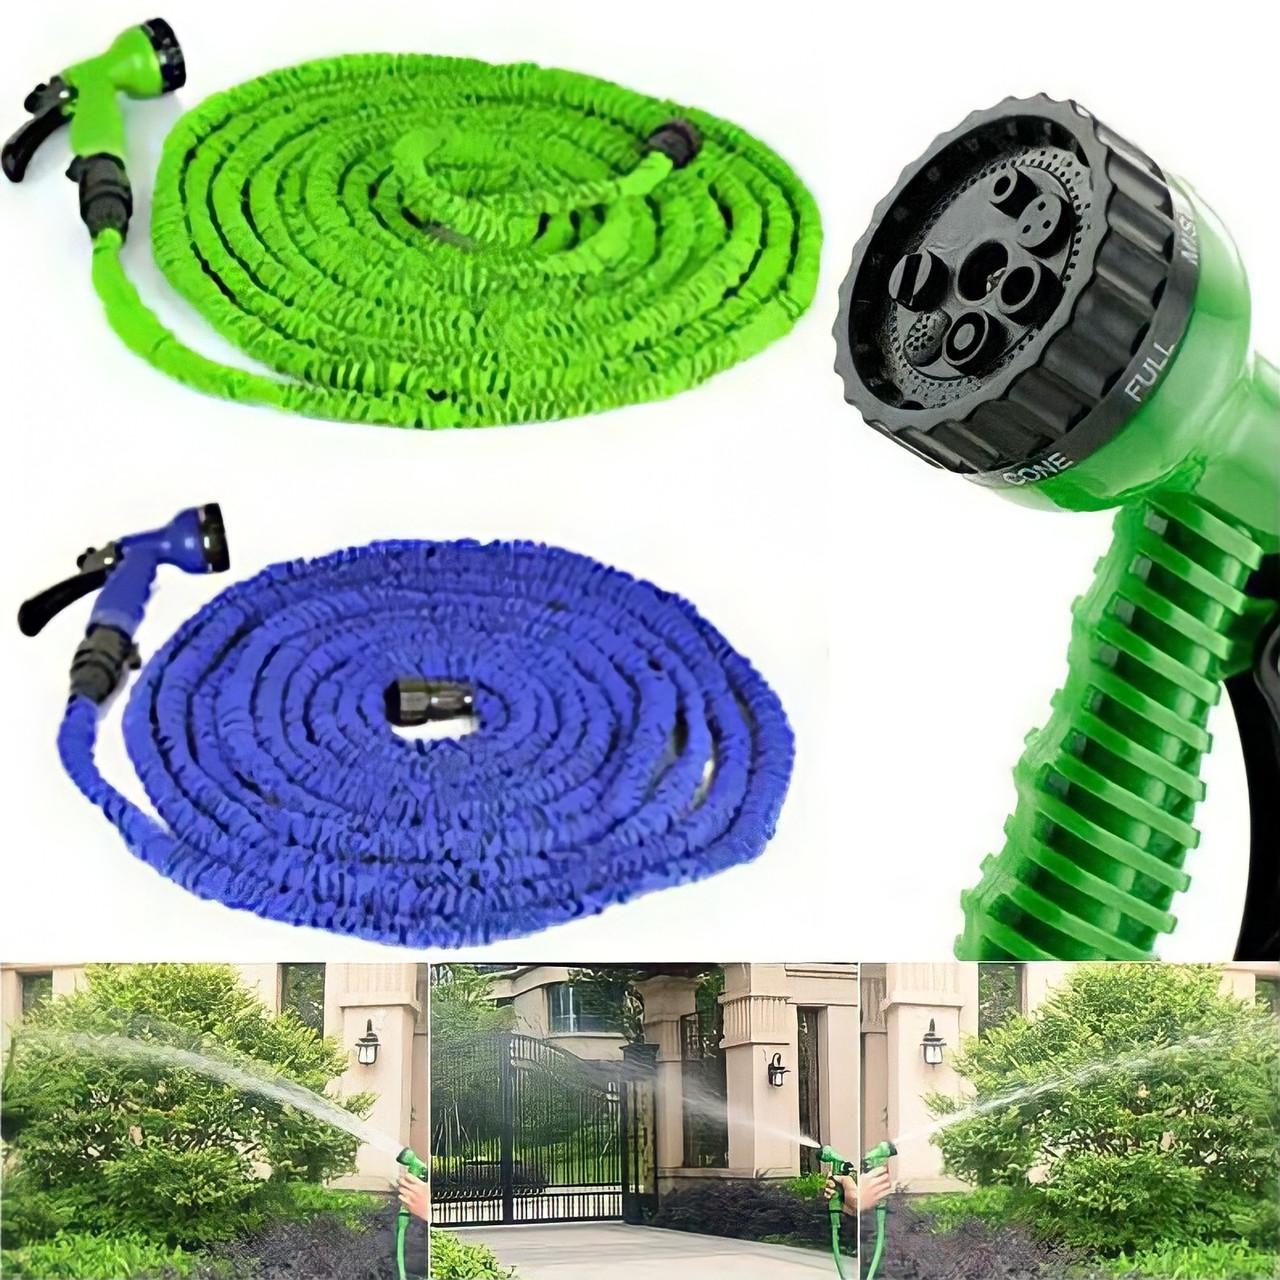 Шланг поливальний X-hose для саду 22,5 м | xhose шланг для поливу